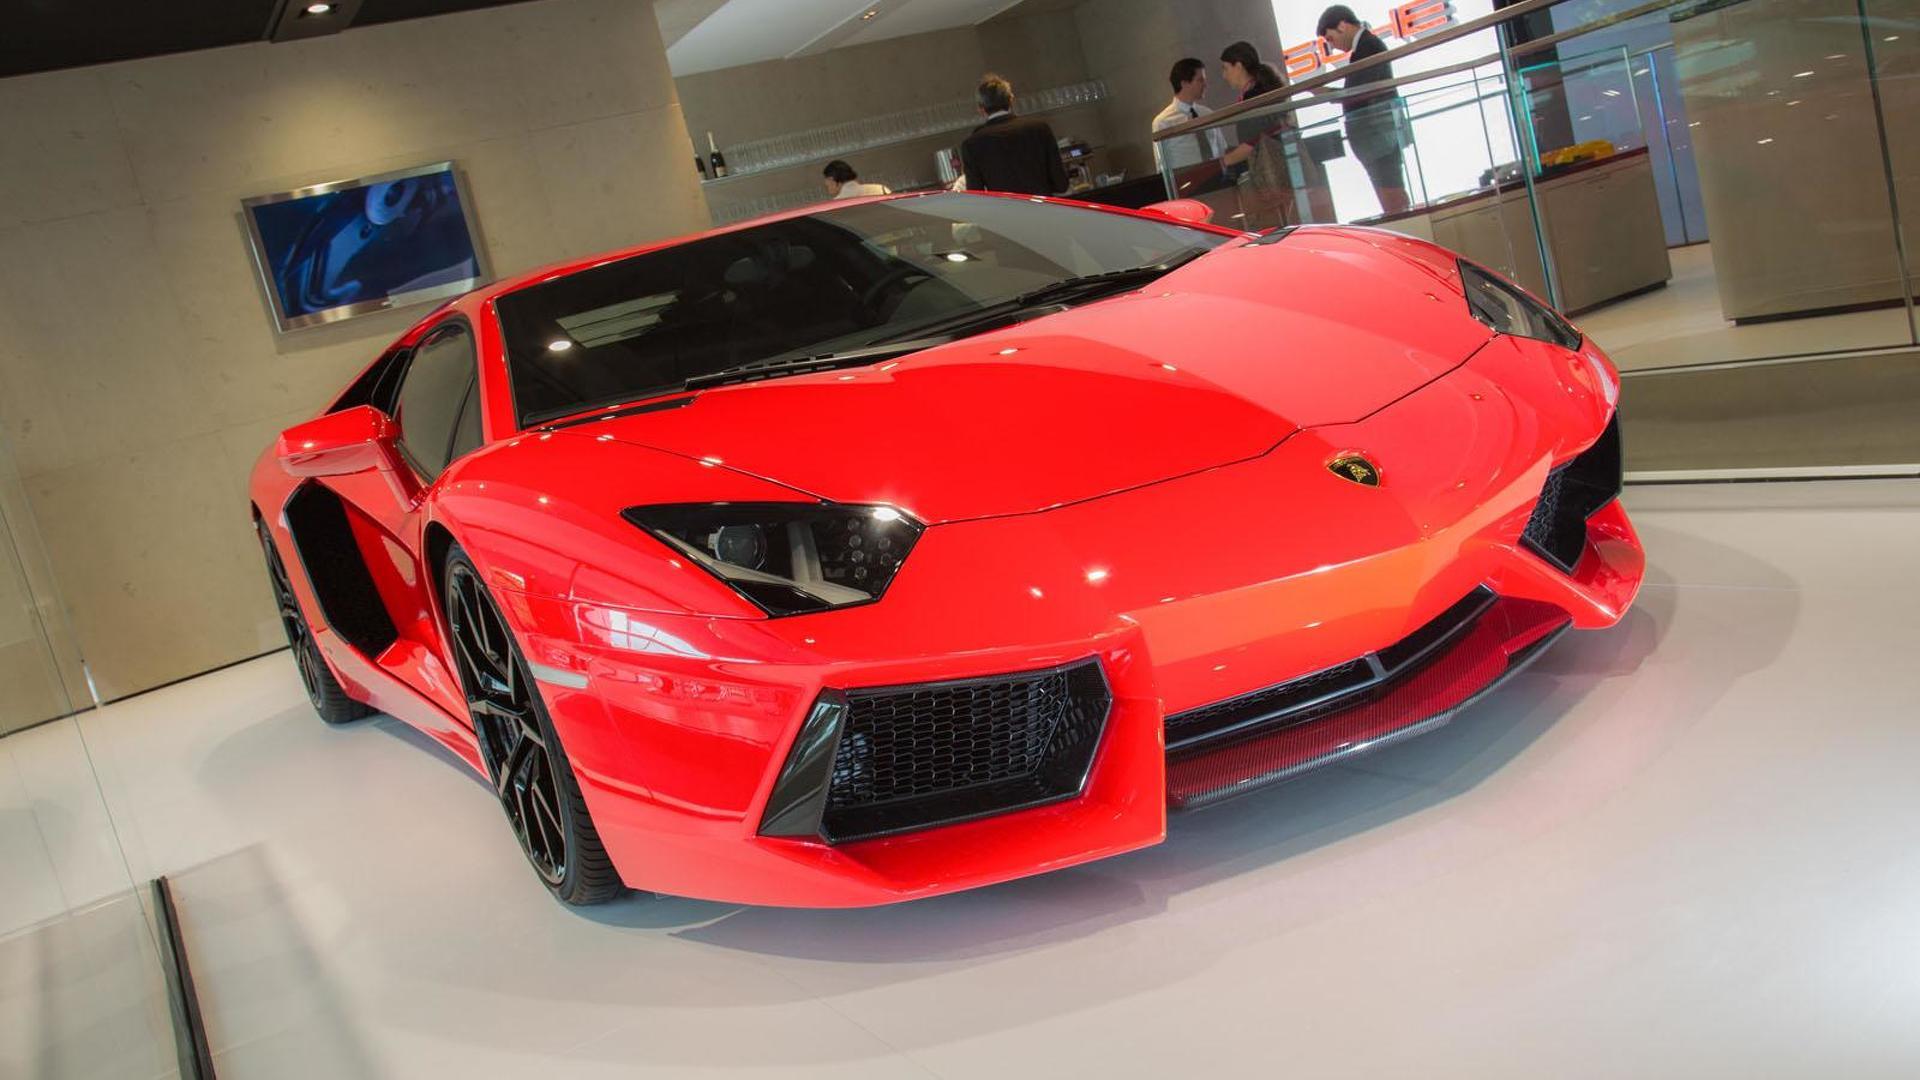 Lamborghini Aventador Four Seat Gt Concept Heading To Geneva Motor Show Report